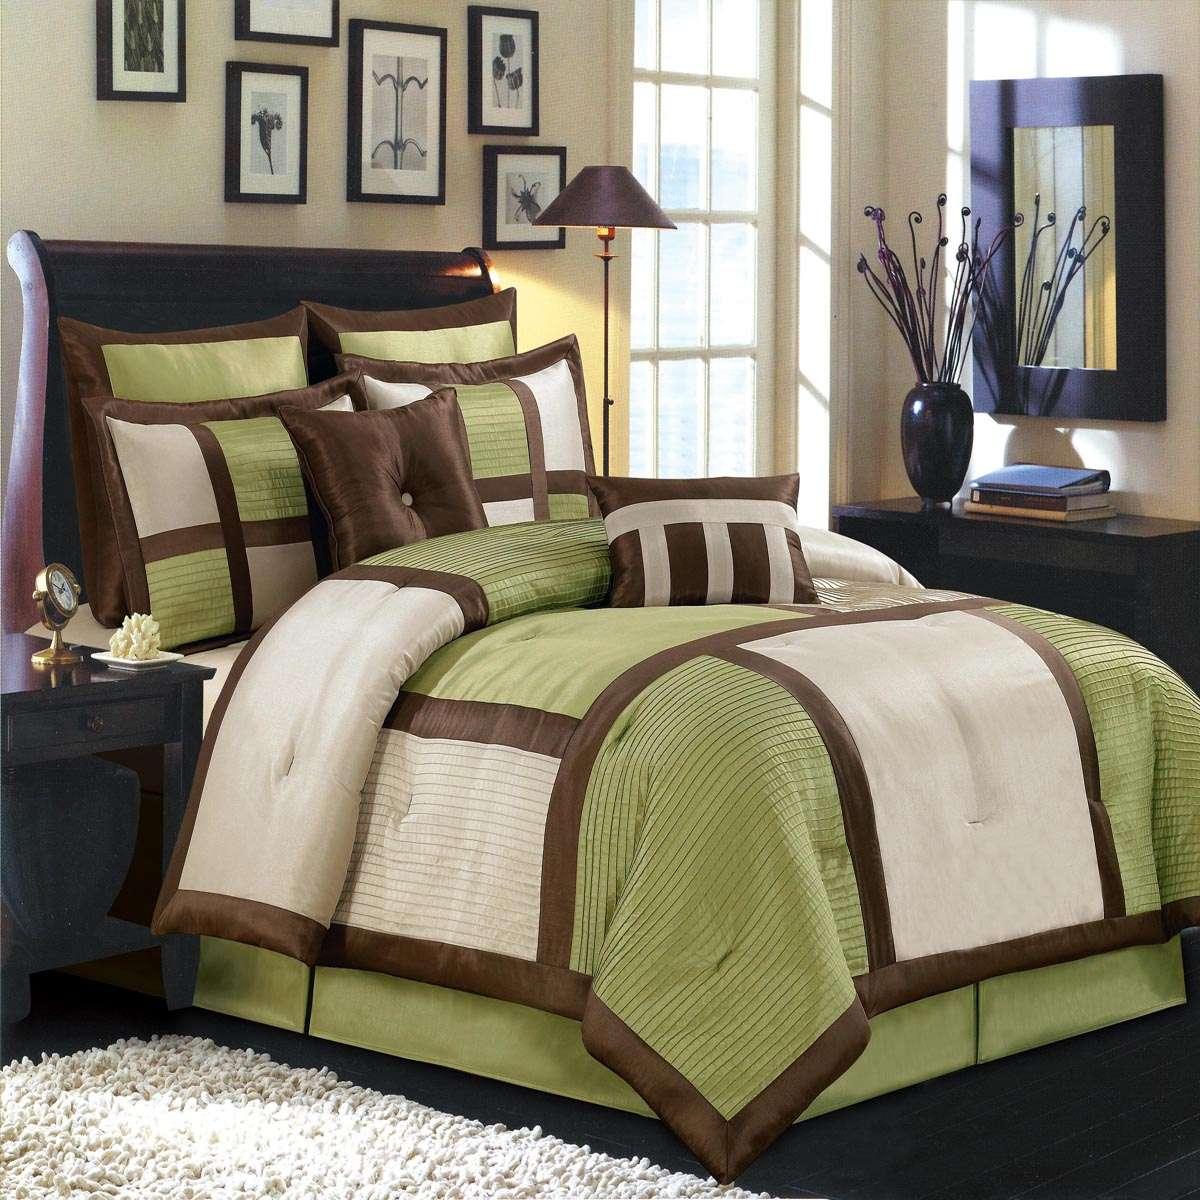 Scotts-sales Morgan Sage Luxury 12-Piece Comforter Set